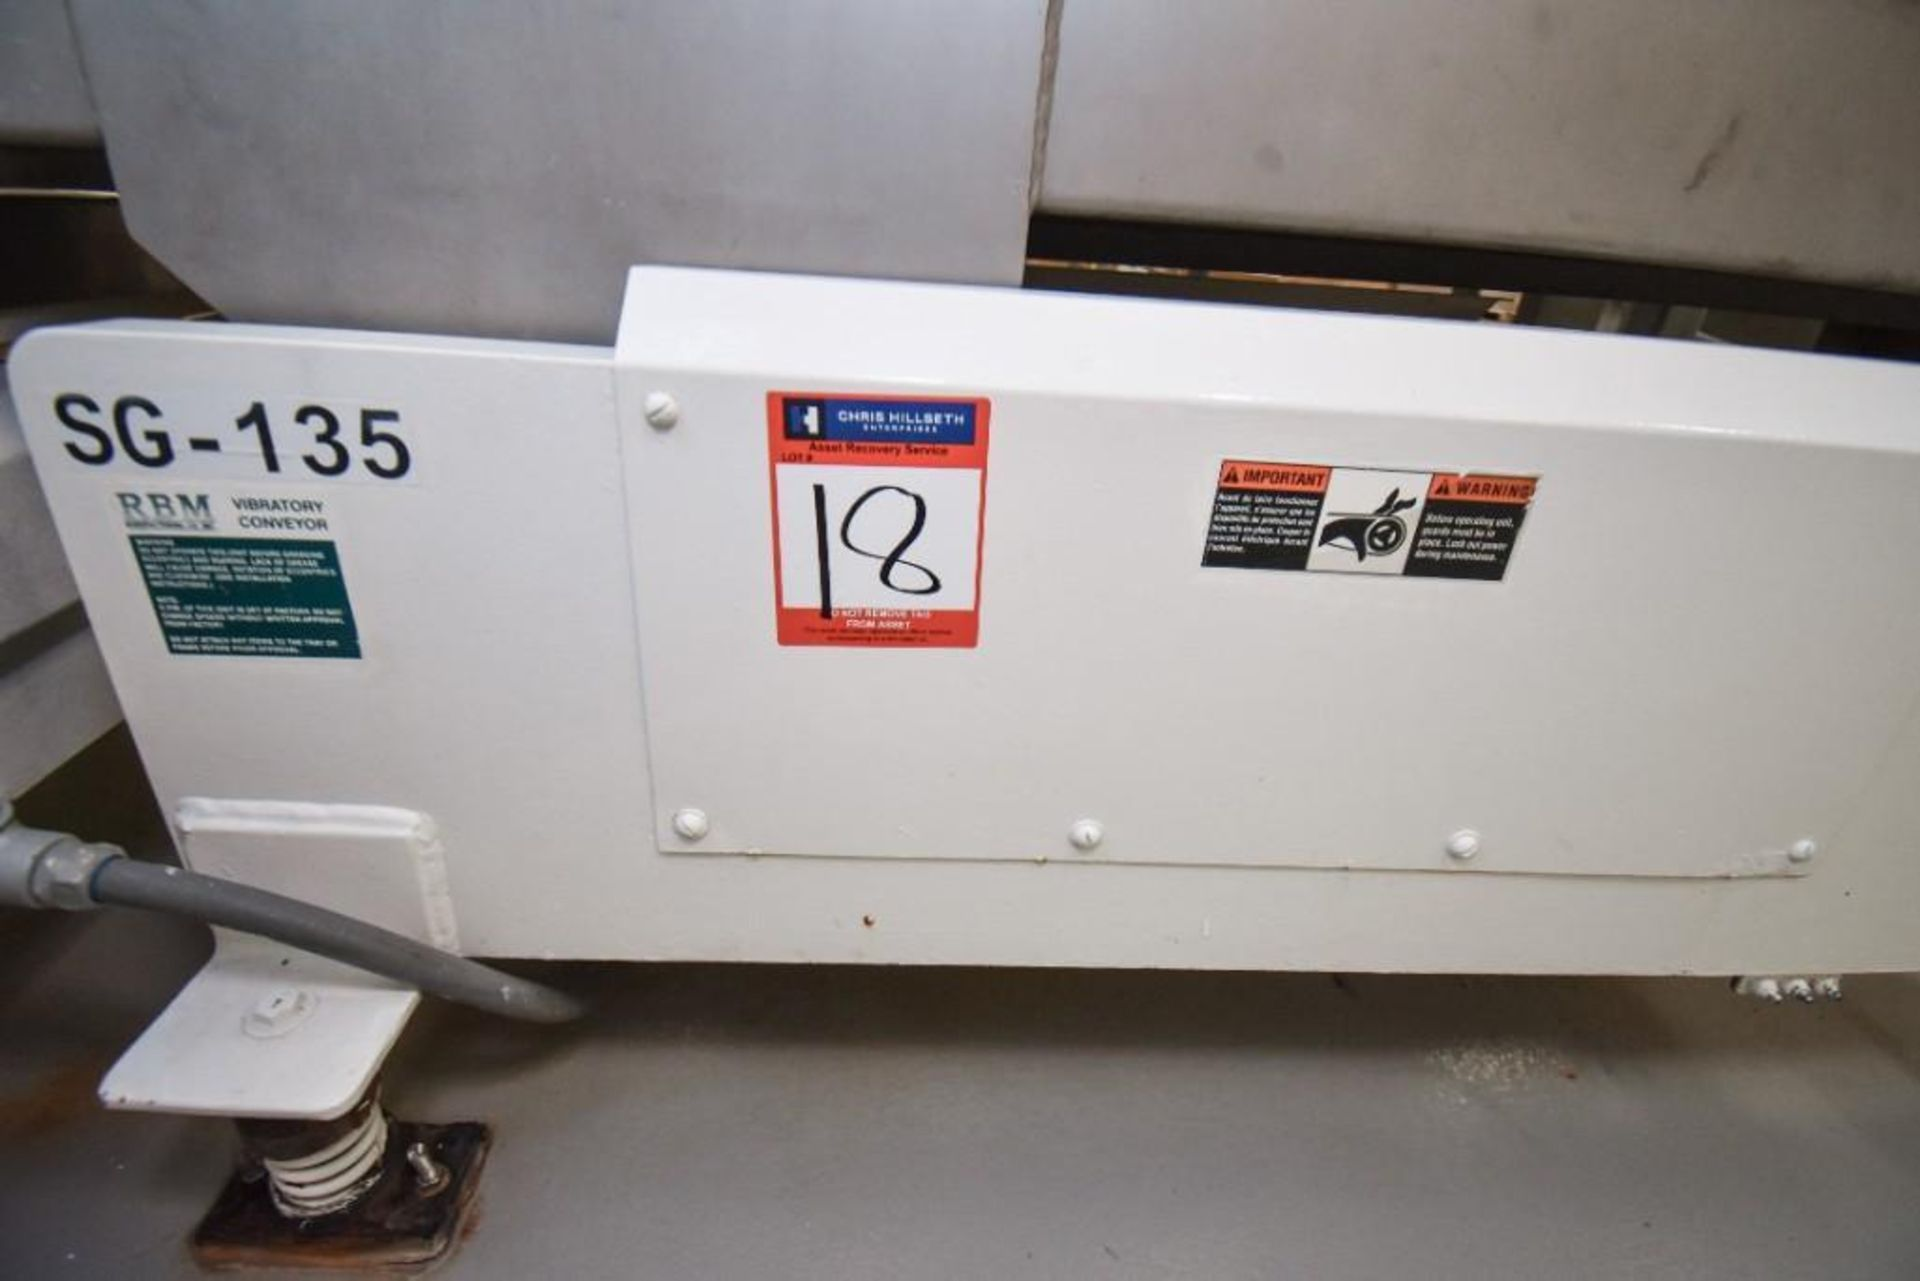 RBM Vibratory Deck VCNF-15X6X7 - Image 2 of 6